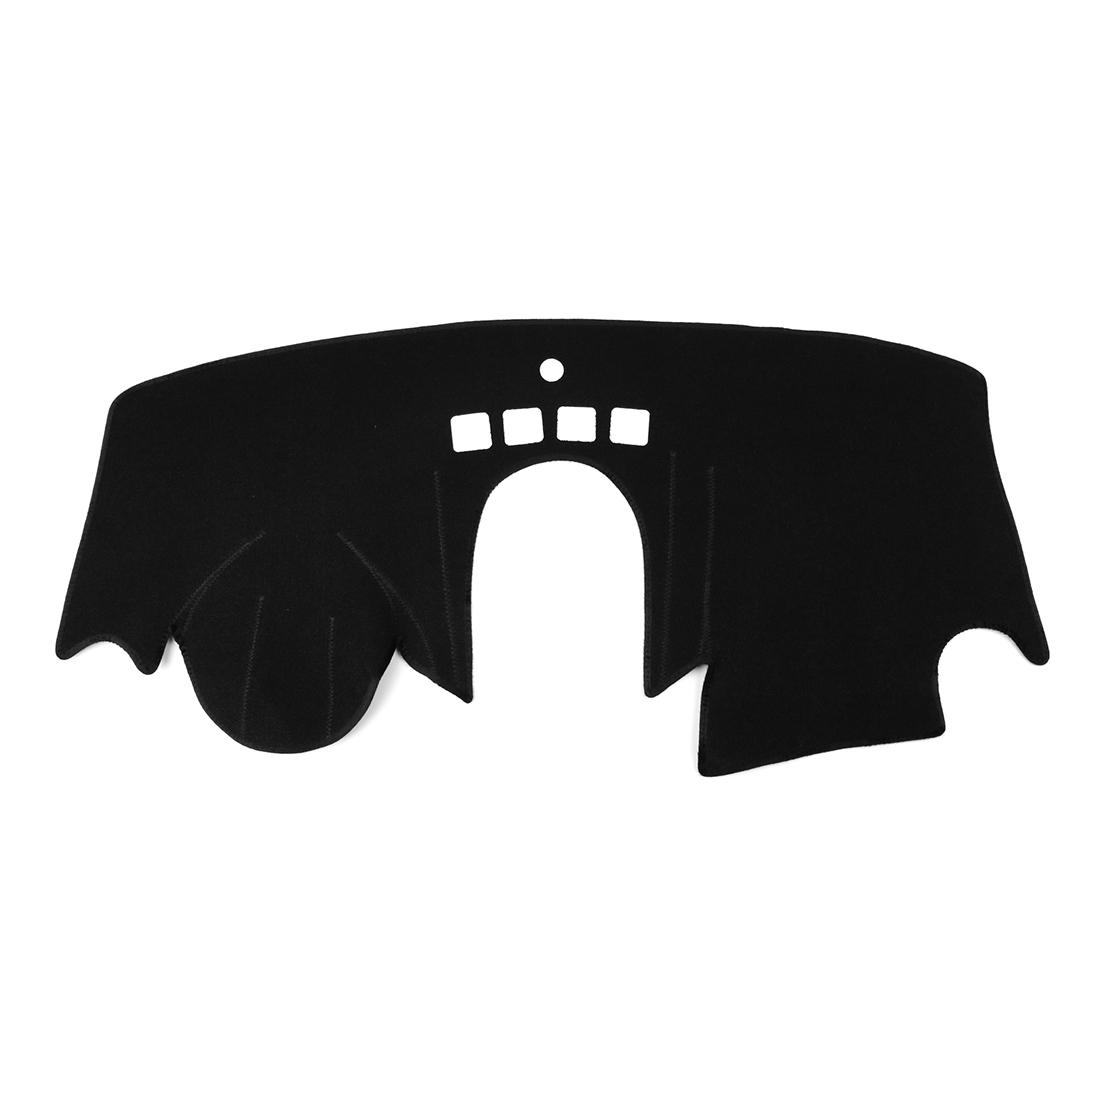 Car Dashboard Cover Nonslip Black Dash Mat Sun Pad for 2015-2016 Ford Fiesta